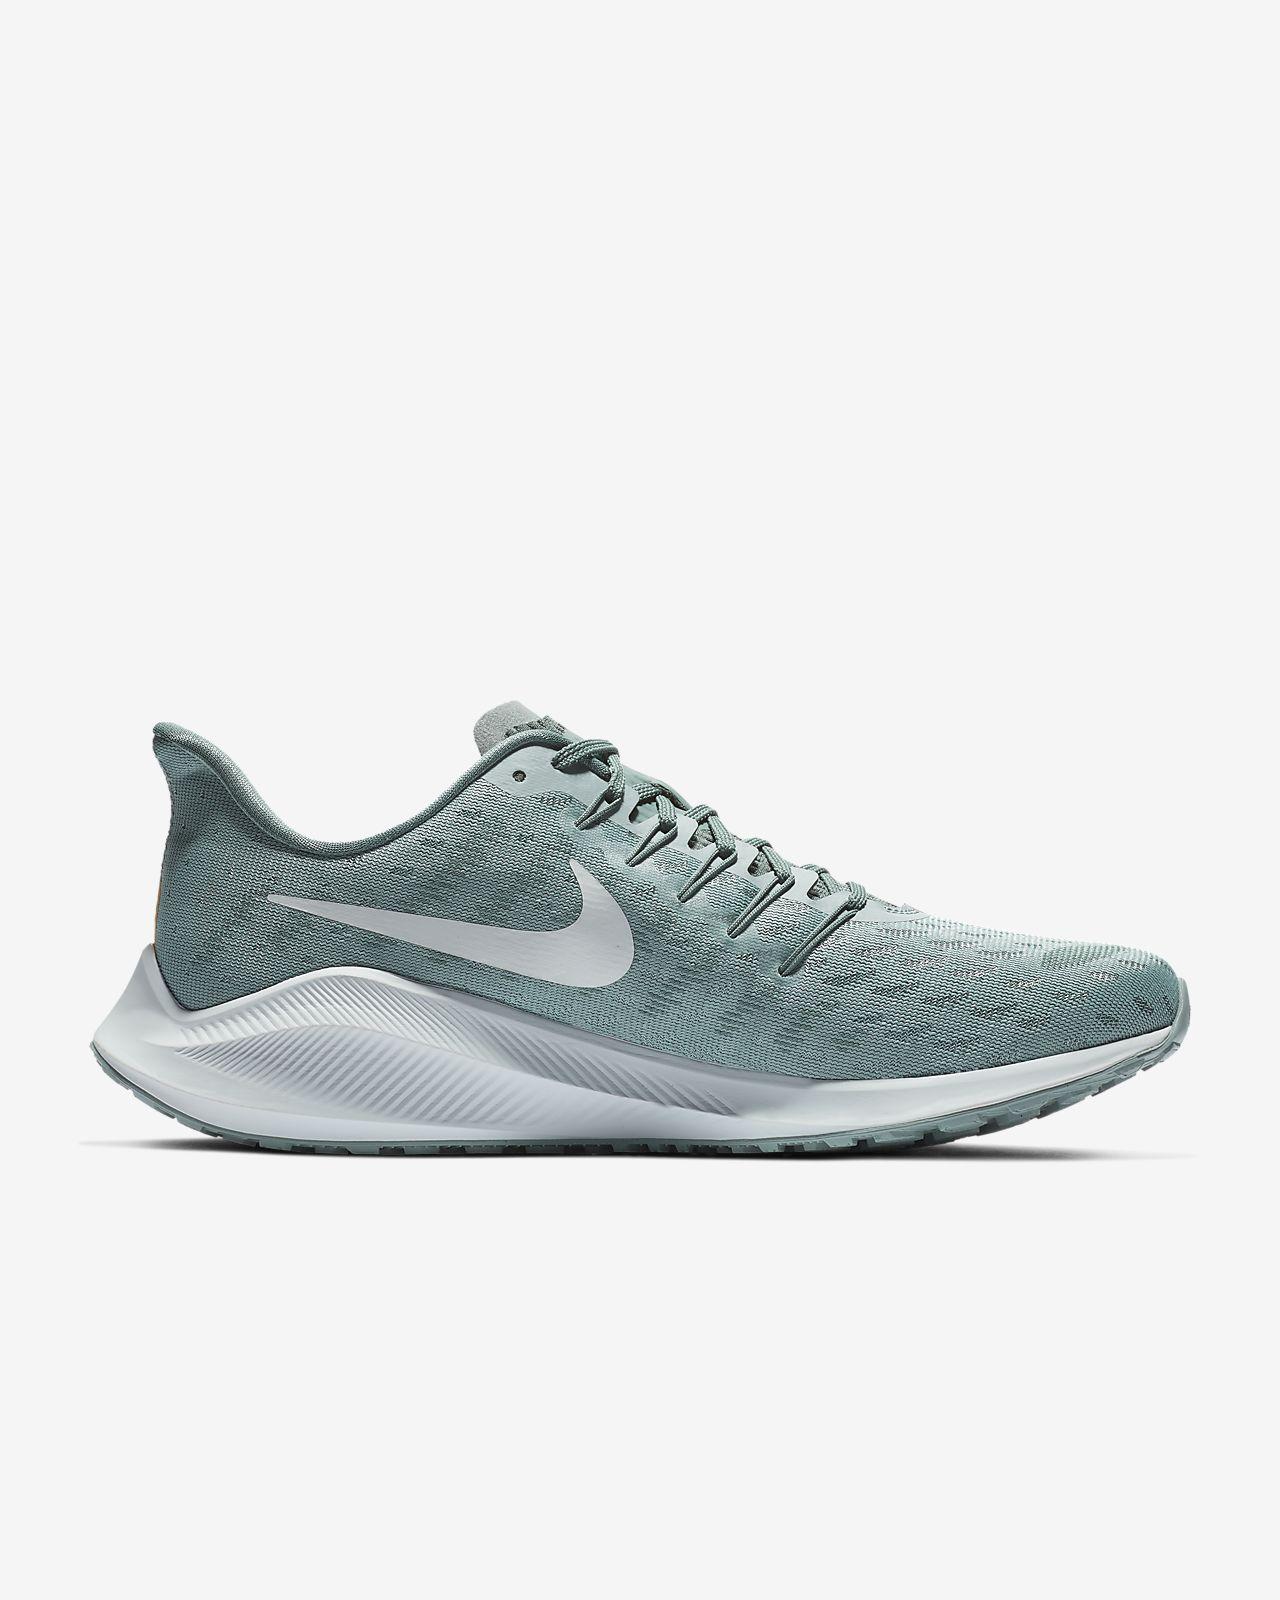 3ca63c6d016 Nike Air Zoom Vomero 14 Men s Running Shoe. Nike.com LU